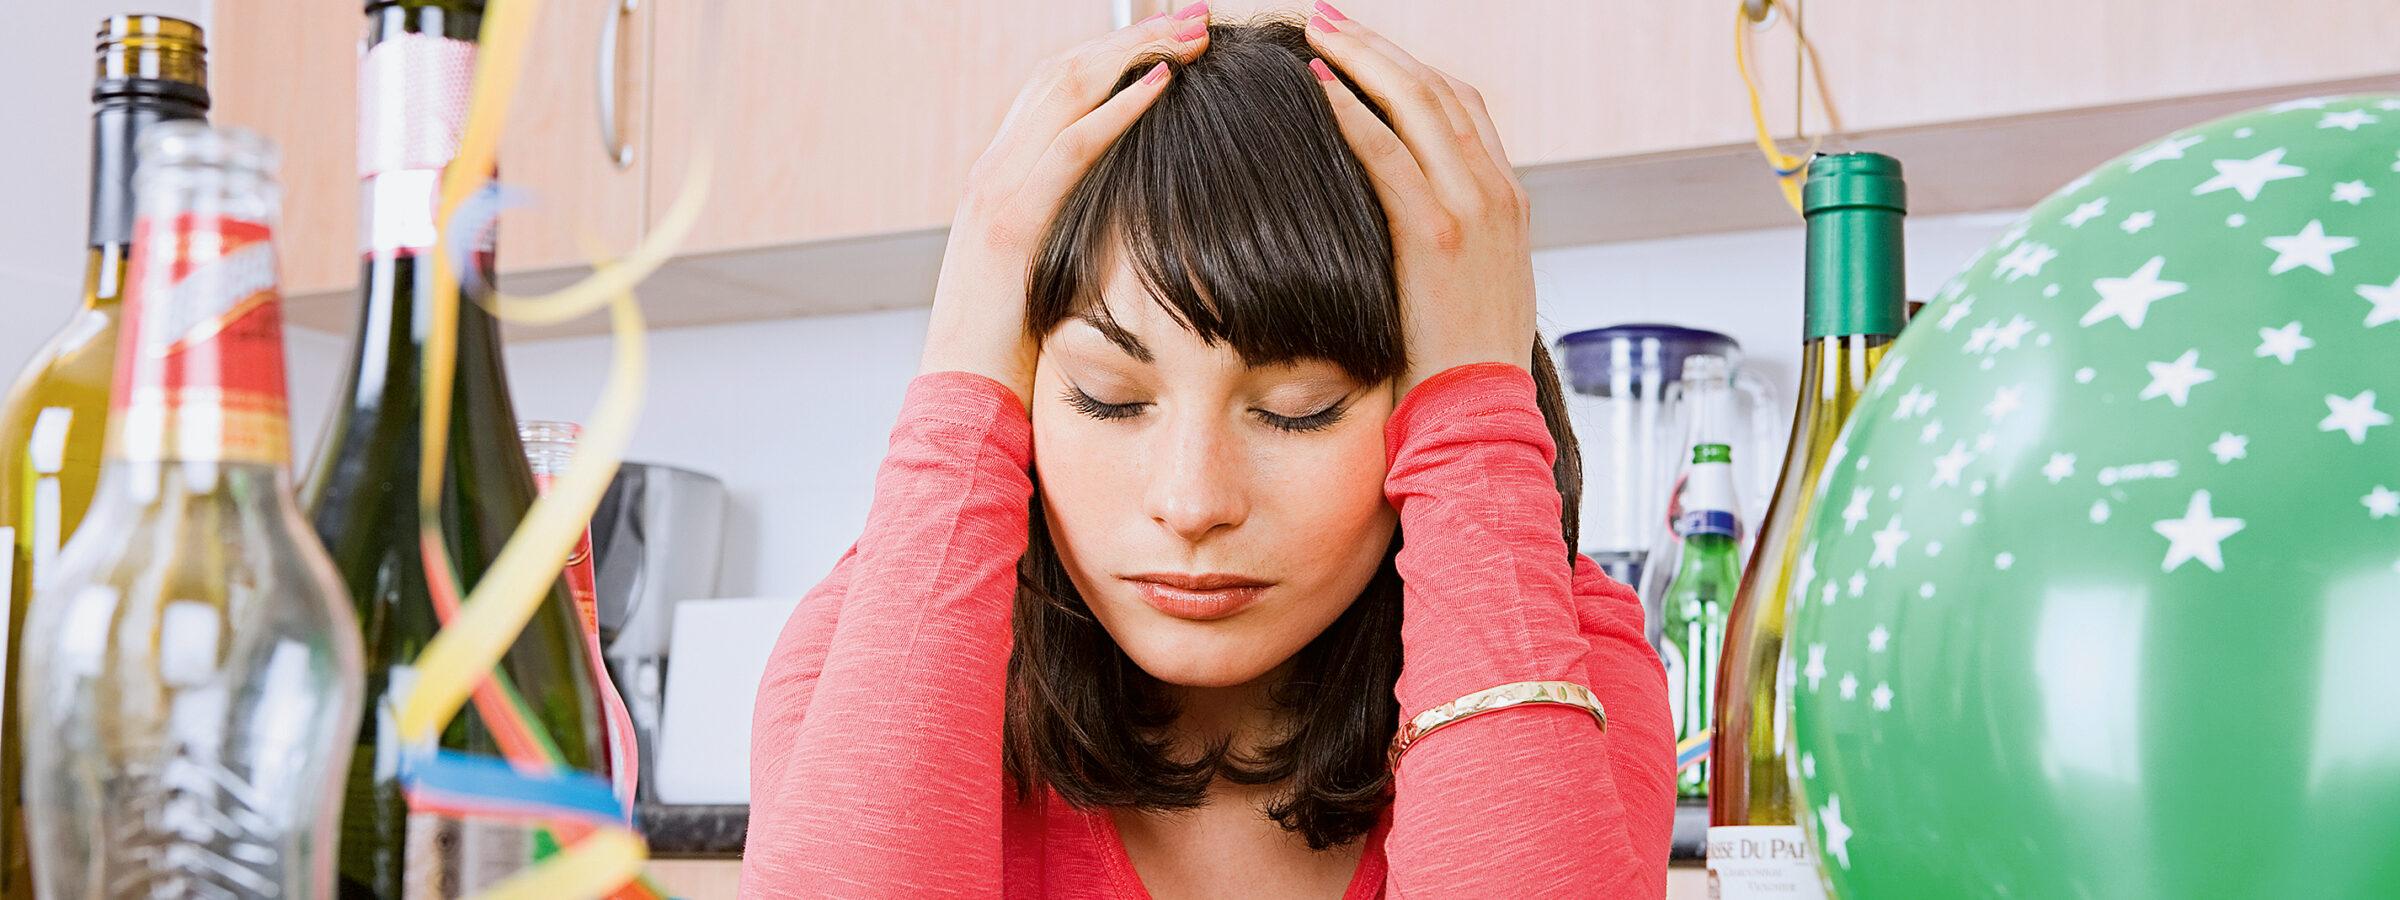 Mal di testa dopo ubriacatura - Feelgoods Farmacie